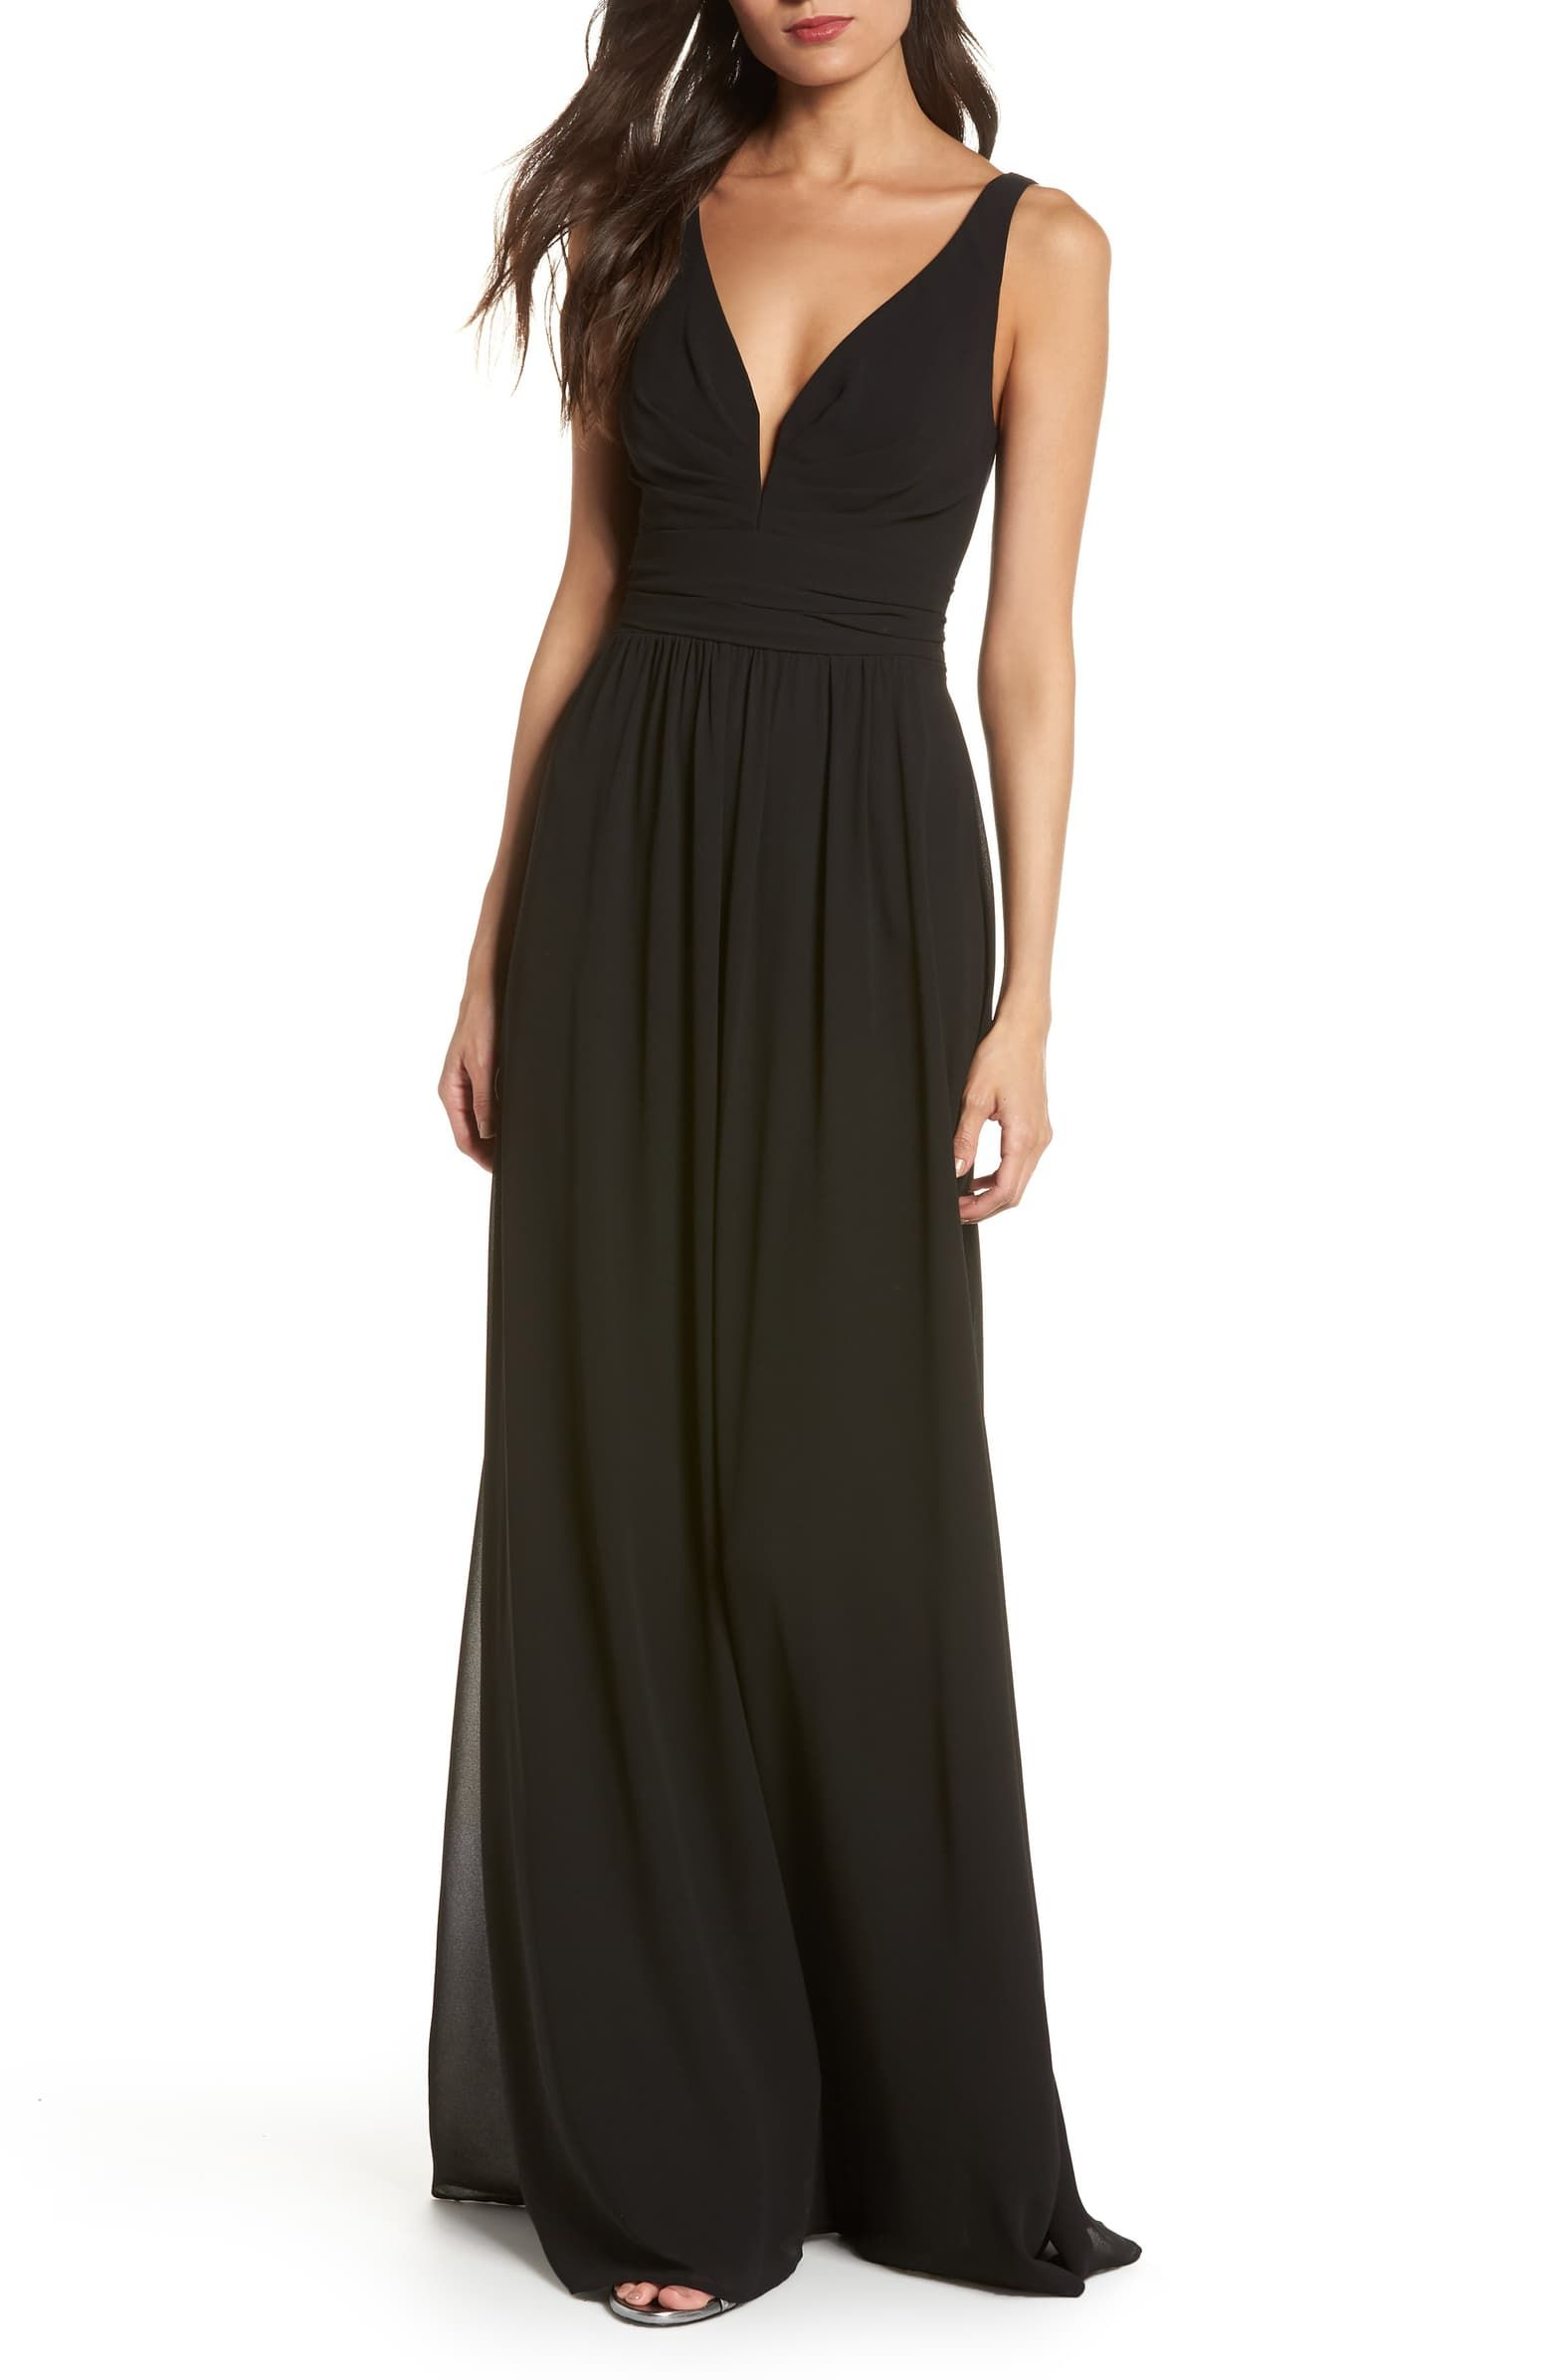 DRESS the POPULATION Bridal Black Iris High Slit V-Neck Stretch Crepe Gown M 8